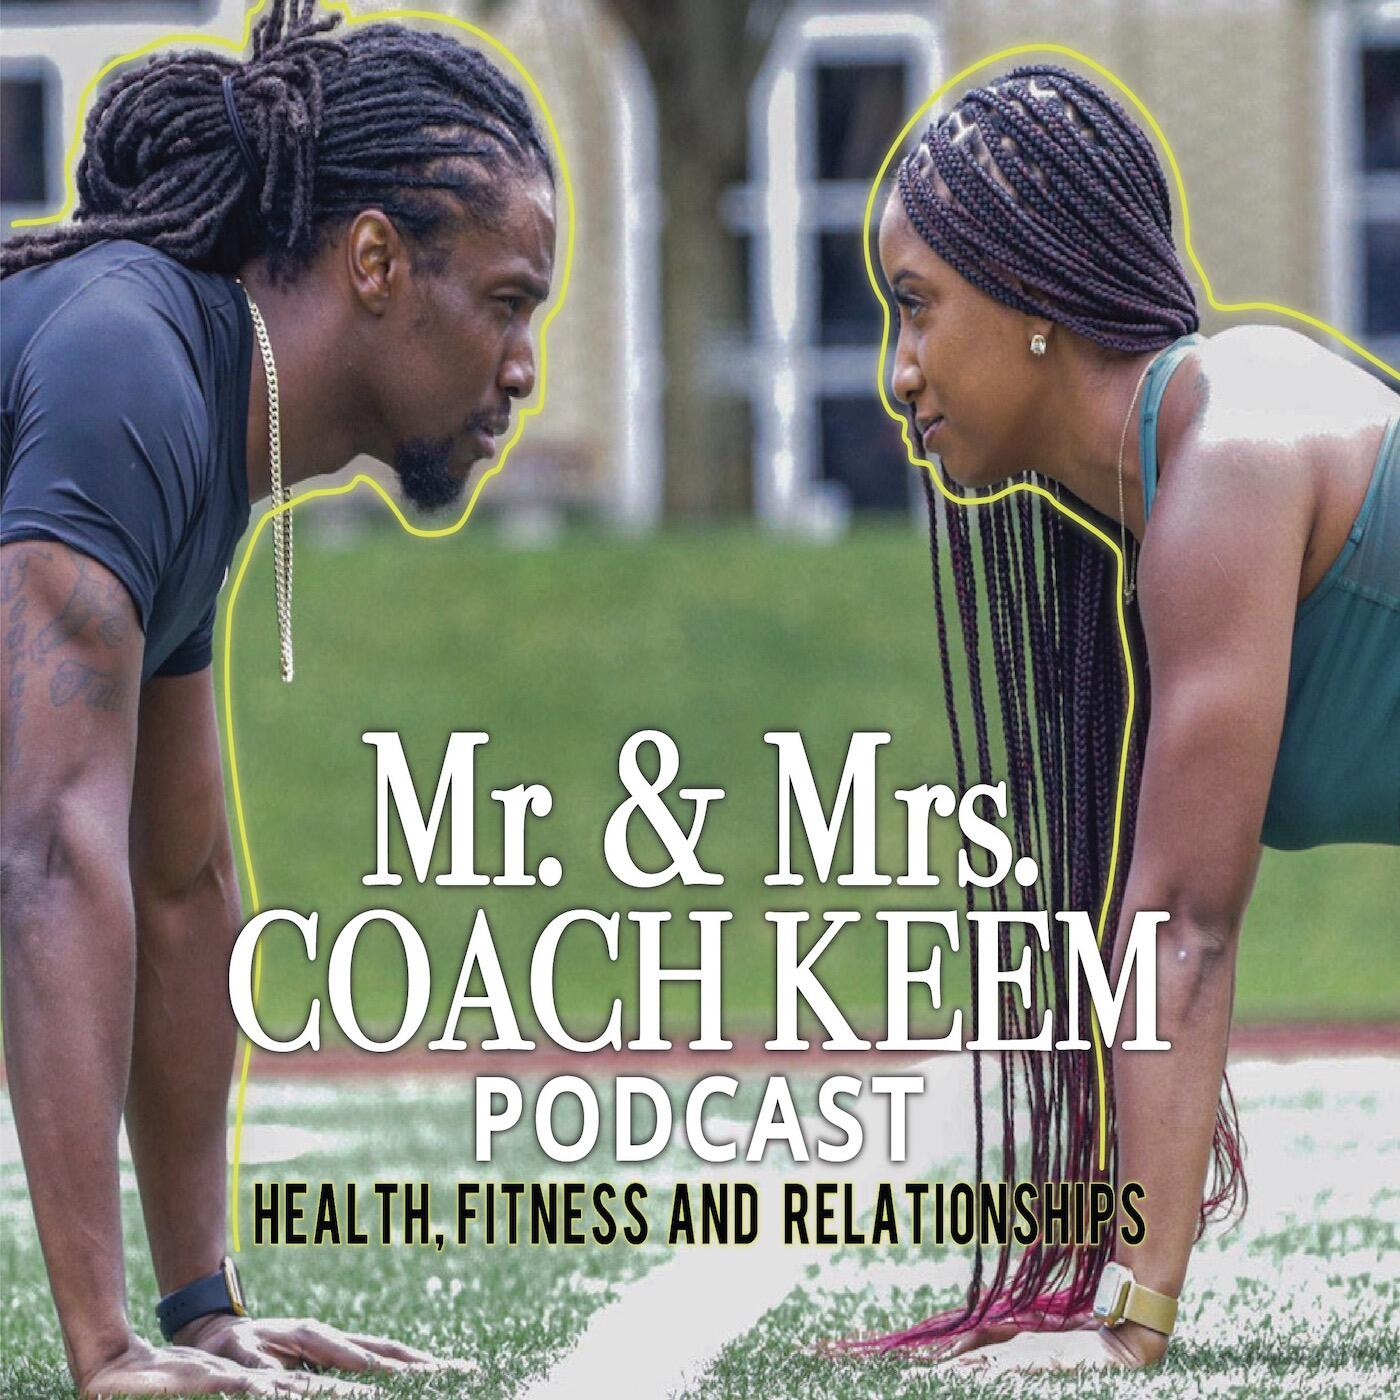 Mr. & Mrs. Coach Keem